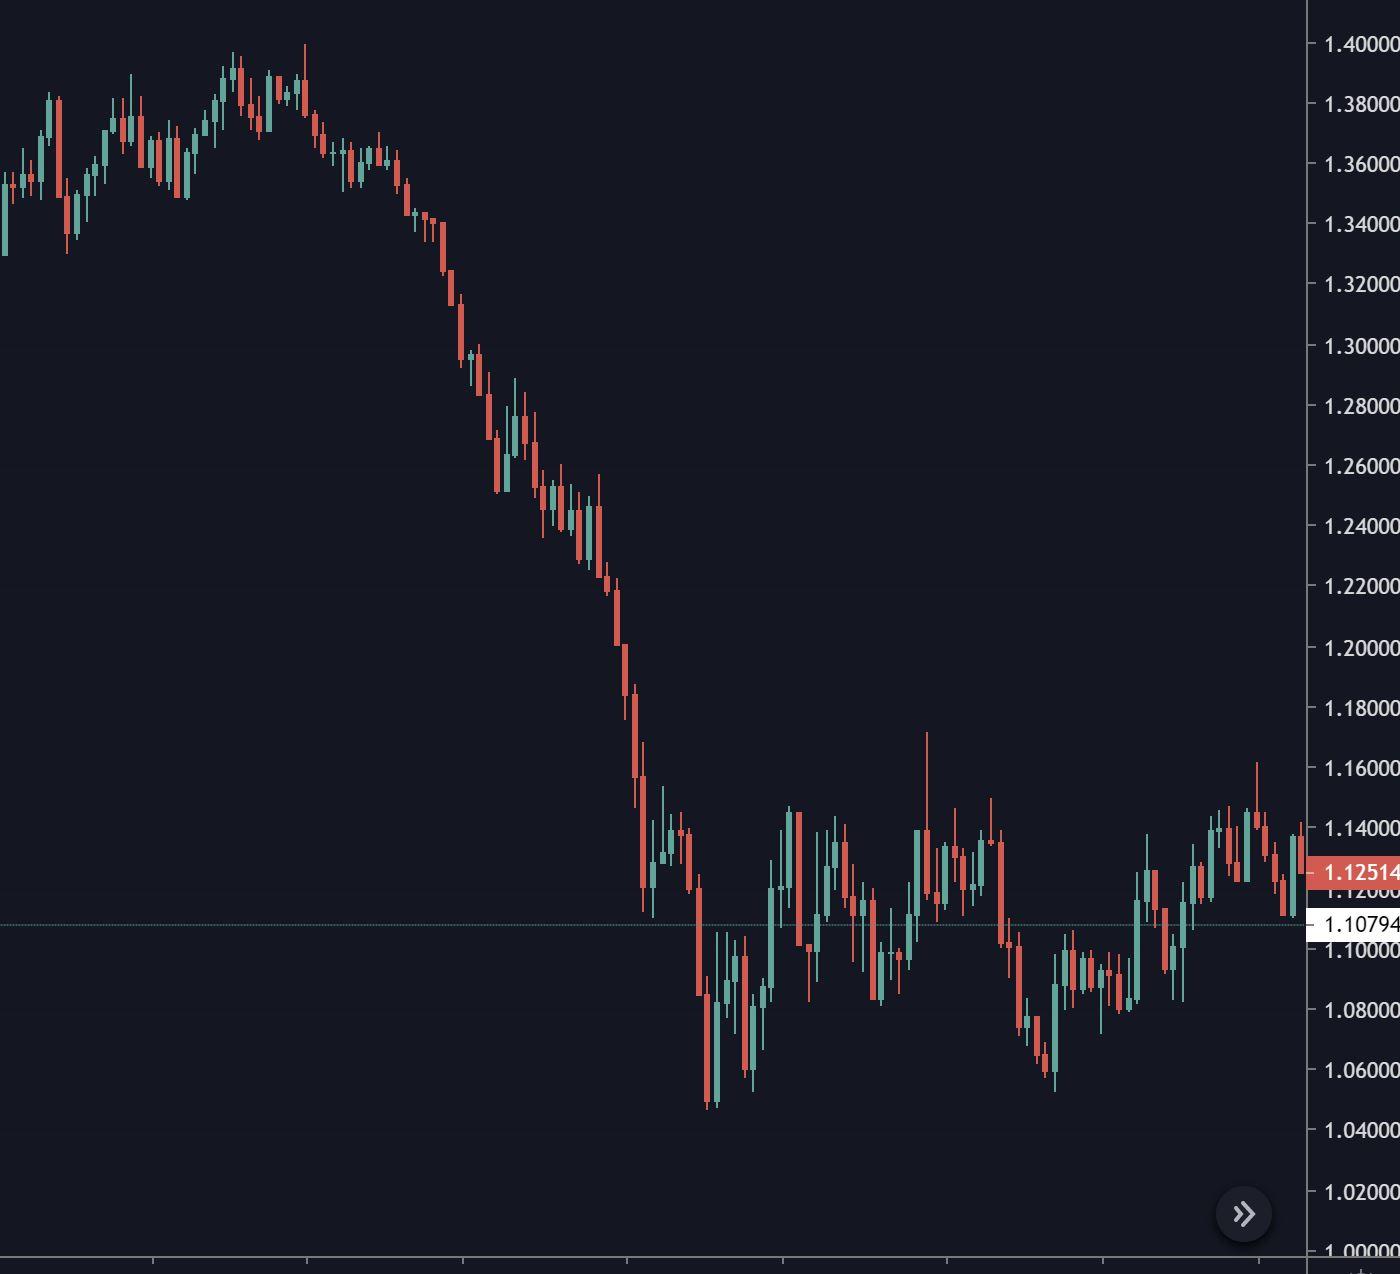 2014 Eur/usd, United States ending QE